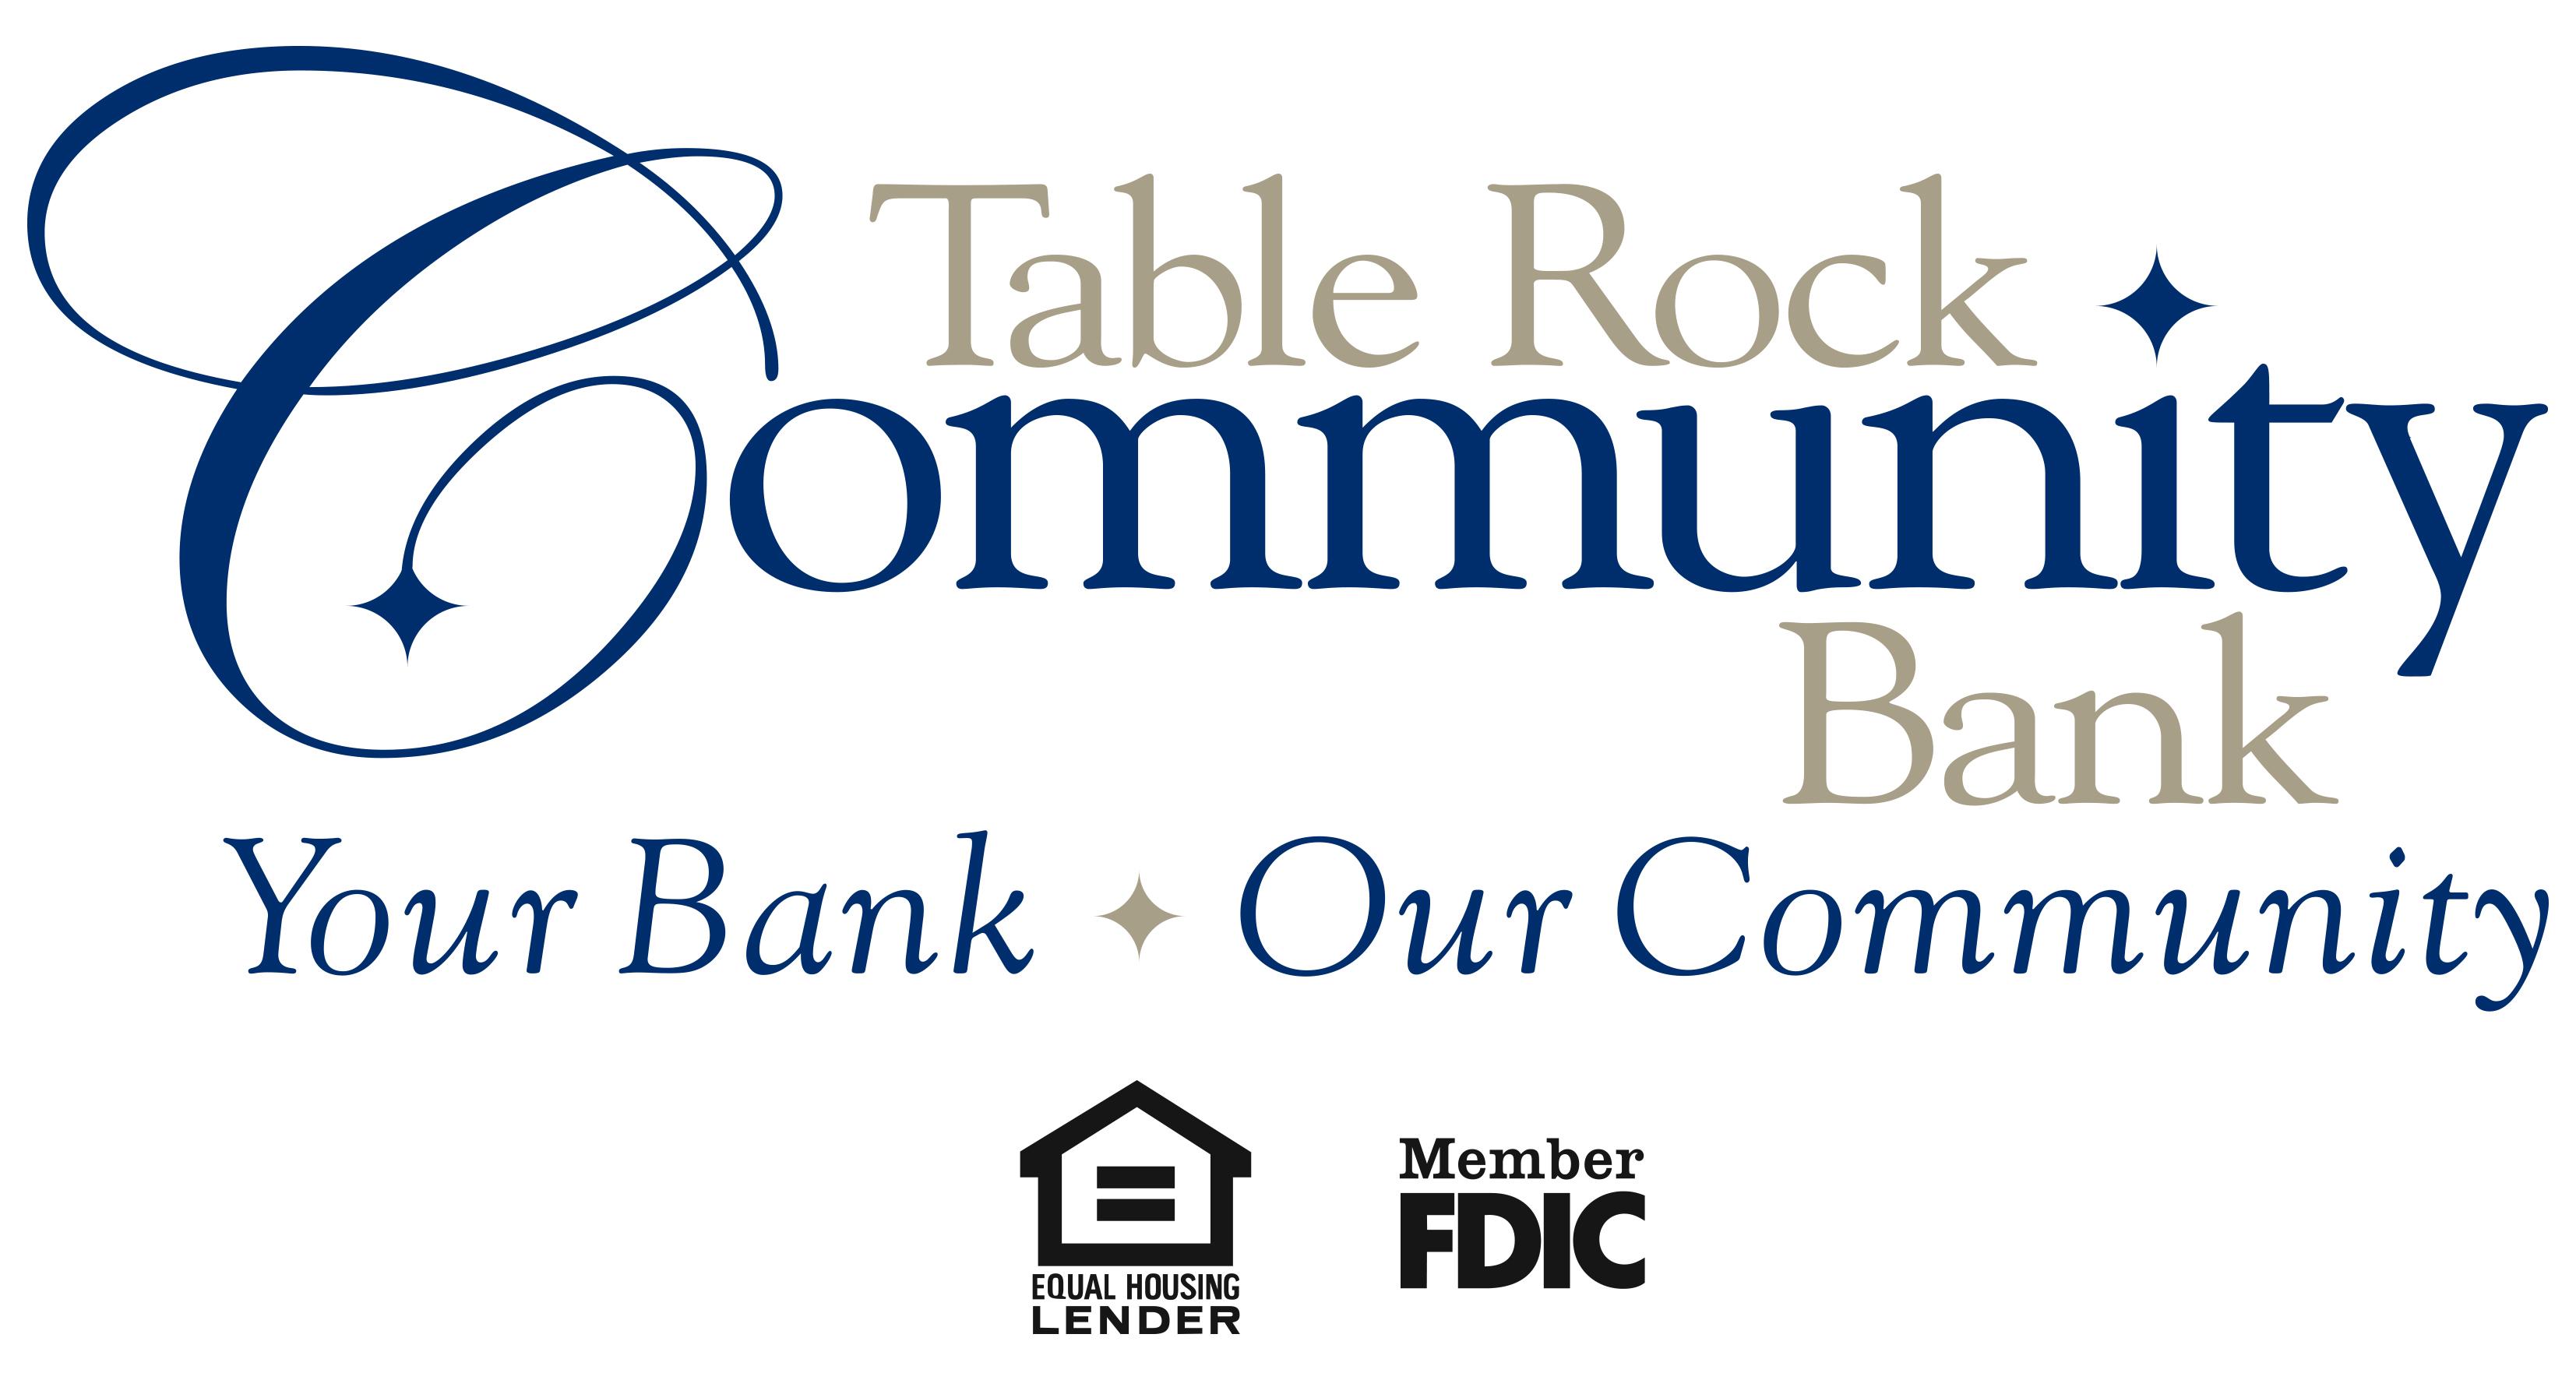 https://growthzonesitesprod.azureedge.net/wp-content/uploads/sites/969/2021/08/Table-Rock-Community-Bank-2021.jpg